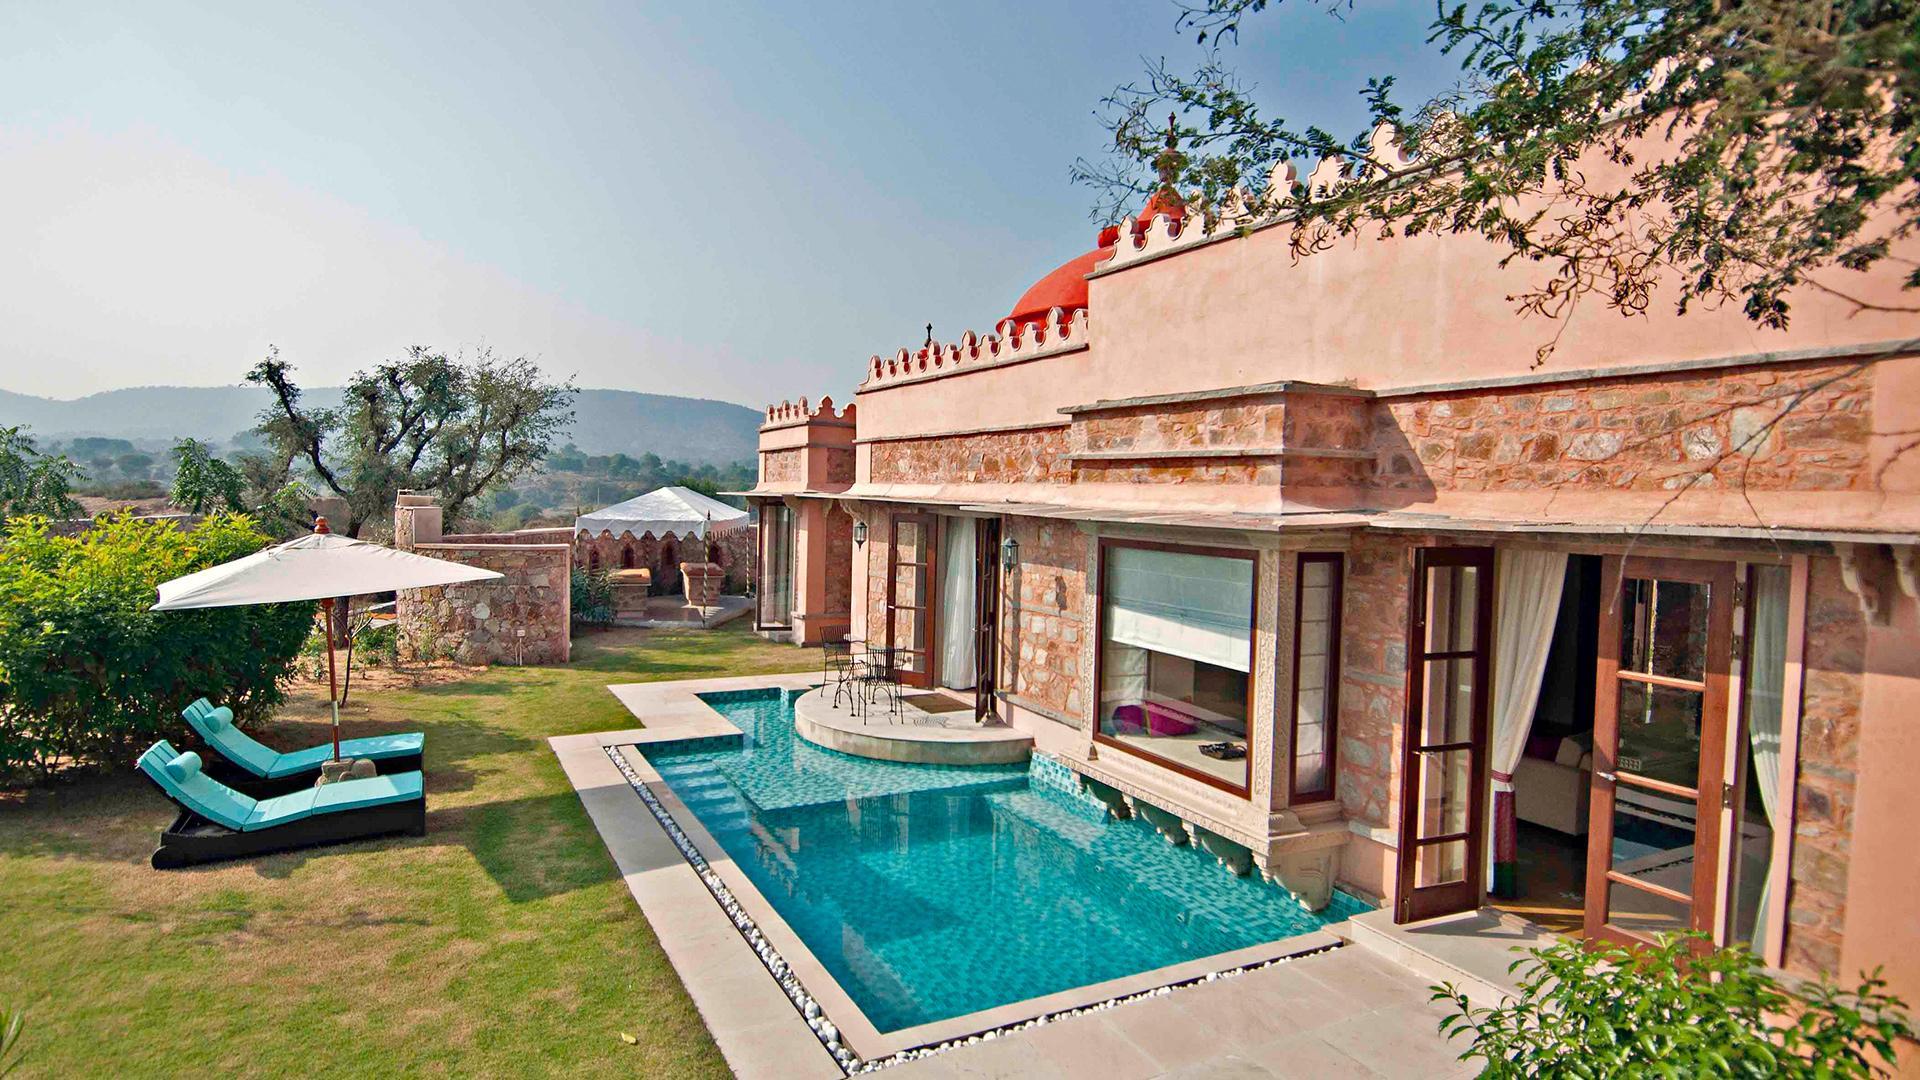 Luxury Pool & Spa Villa image 1 at The Tree of Life Resort & Spa by Jaipur, Rajasthan, India